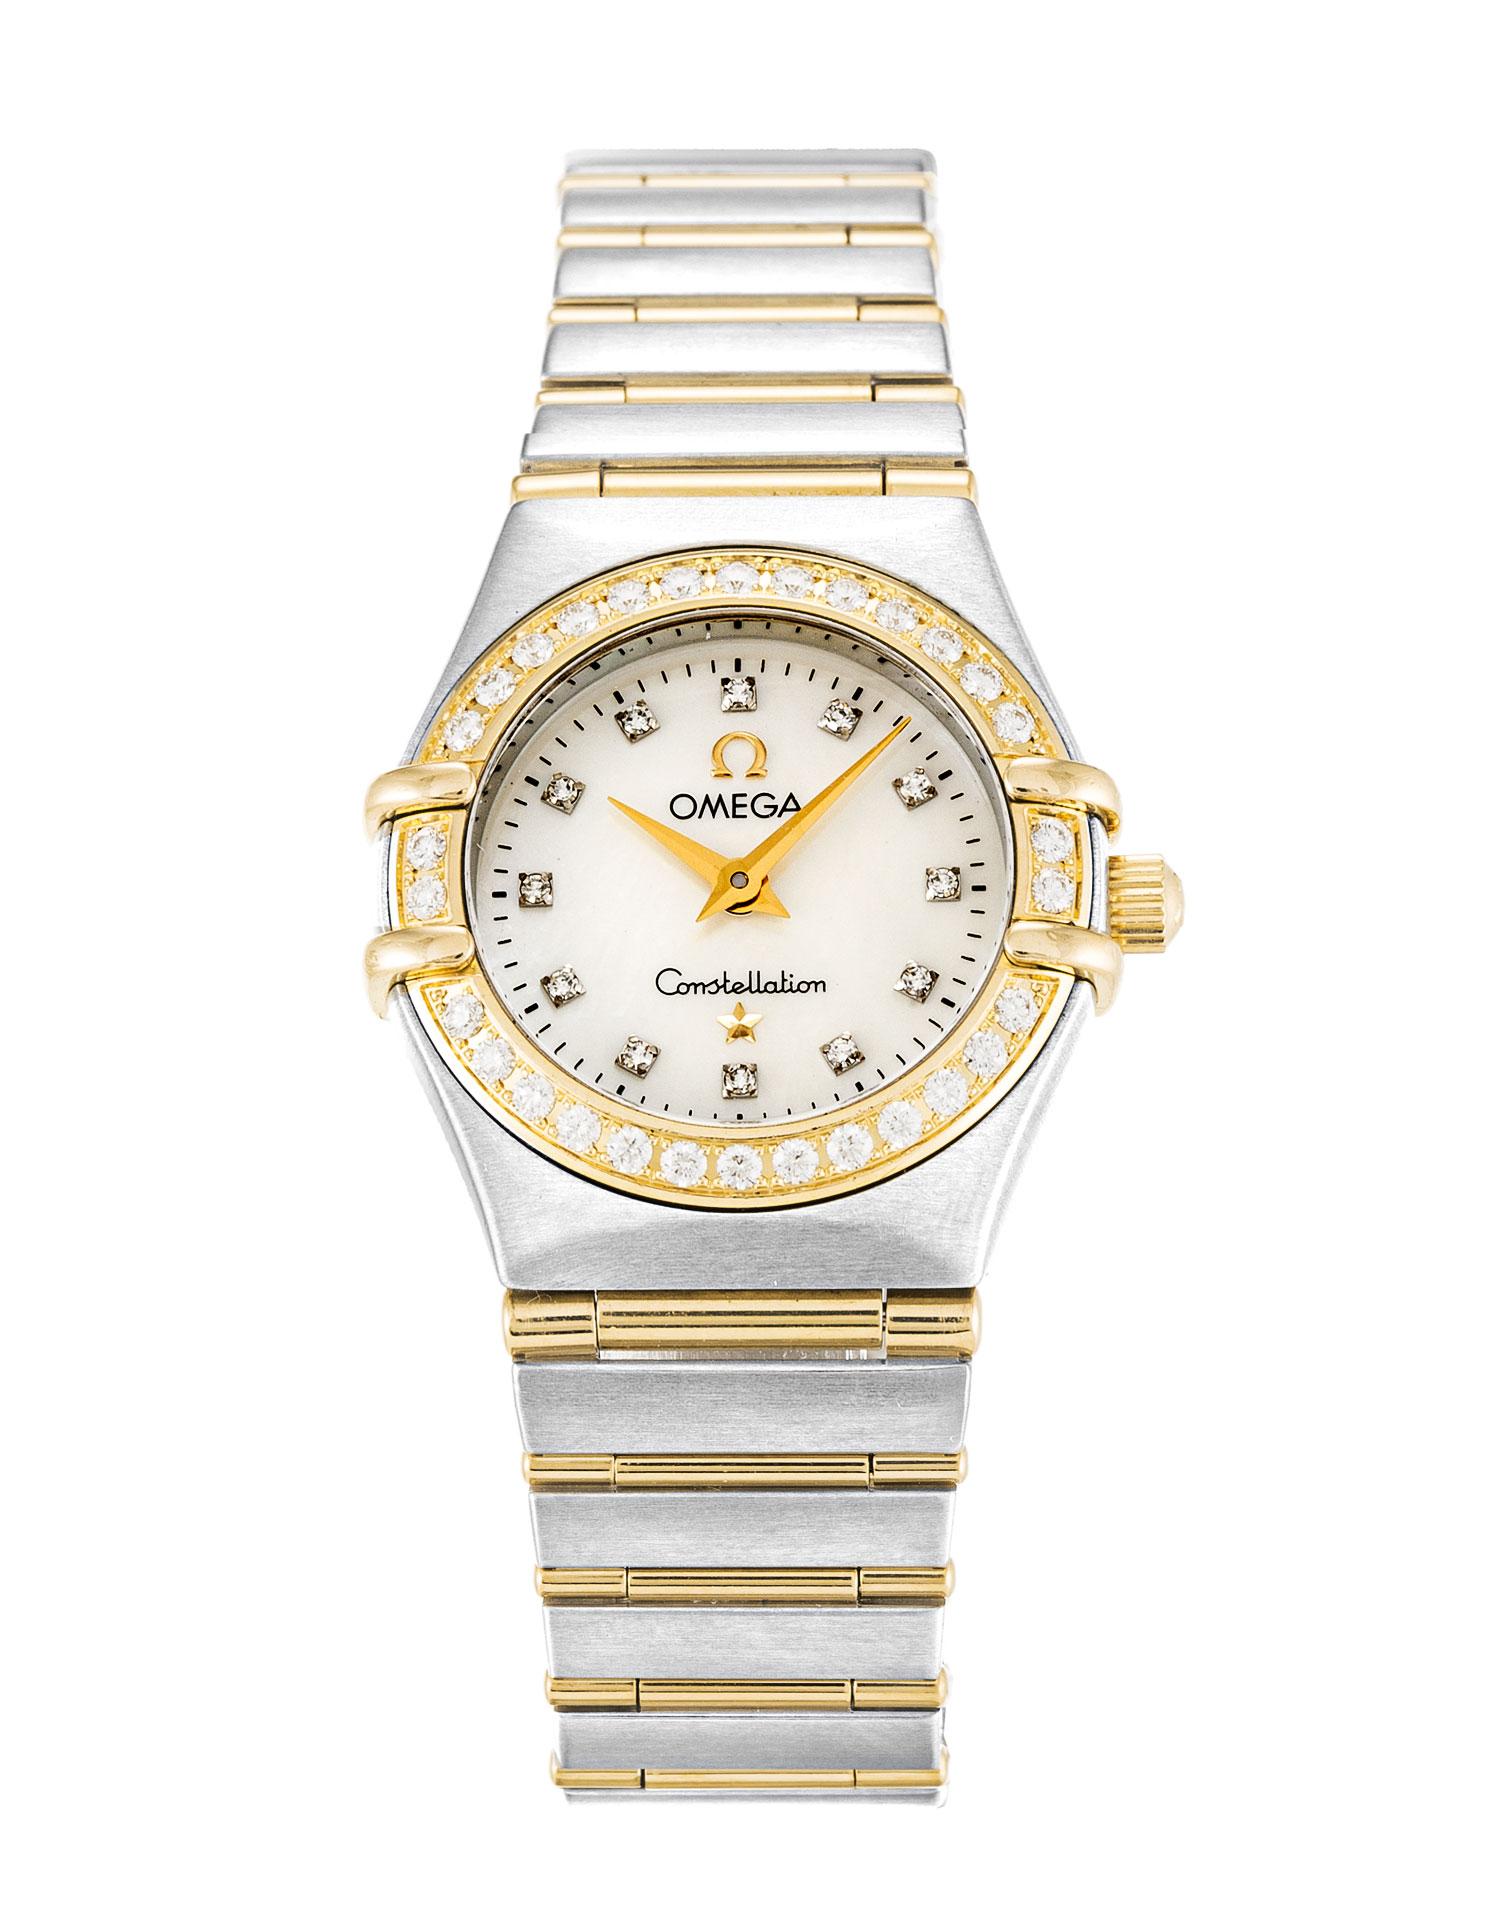 Omega Constellation Mini 1267.75.00 Ladies 22.5 Mm Steel & Yellow Gold Set With Diamonds Case Quartz Movement – iapac.to